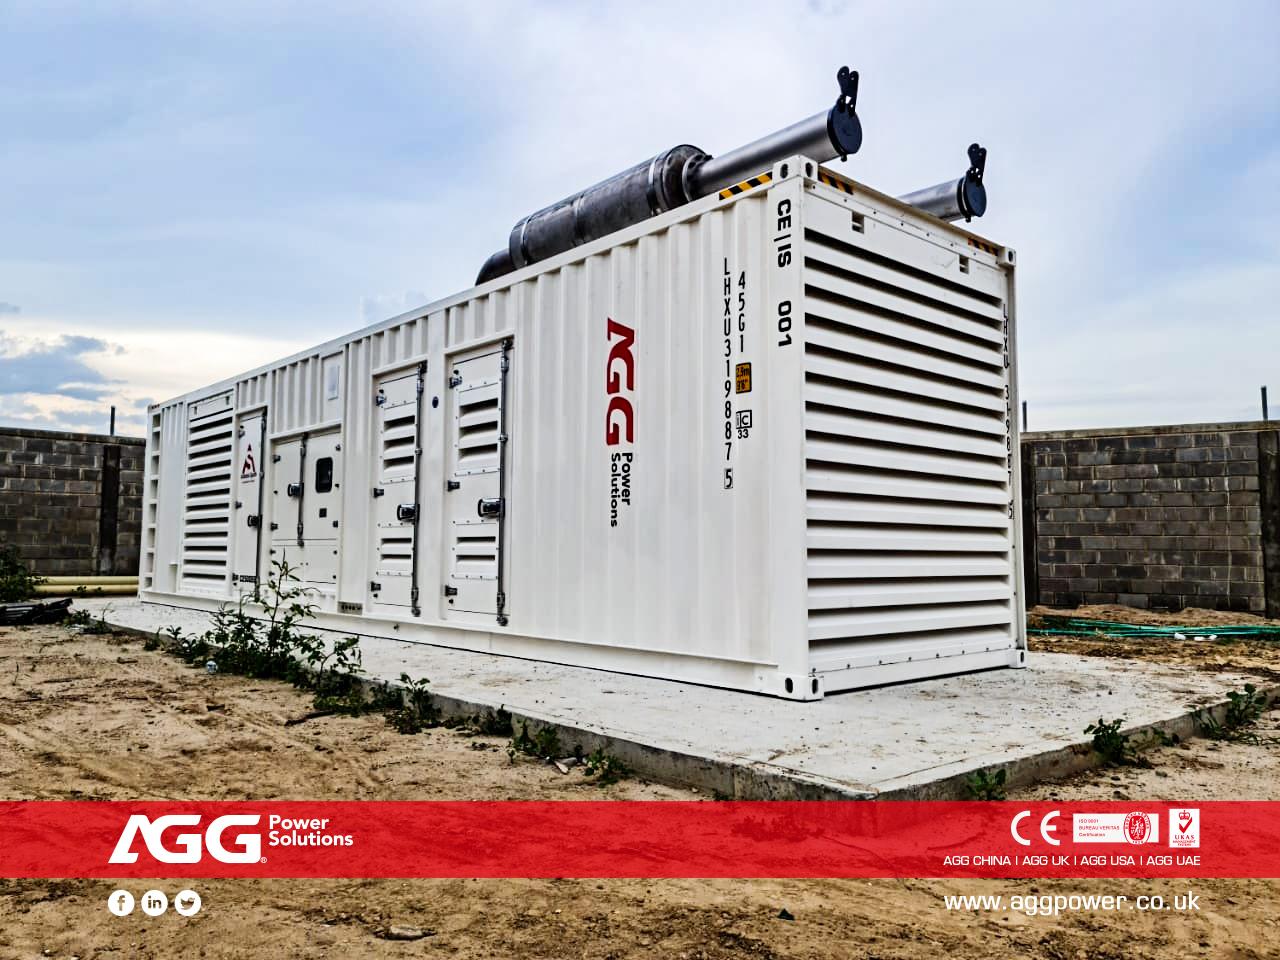 AGG C Series 丨2500kVA 60Hz丨Colombia